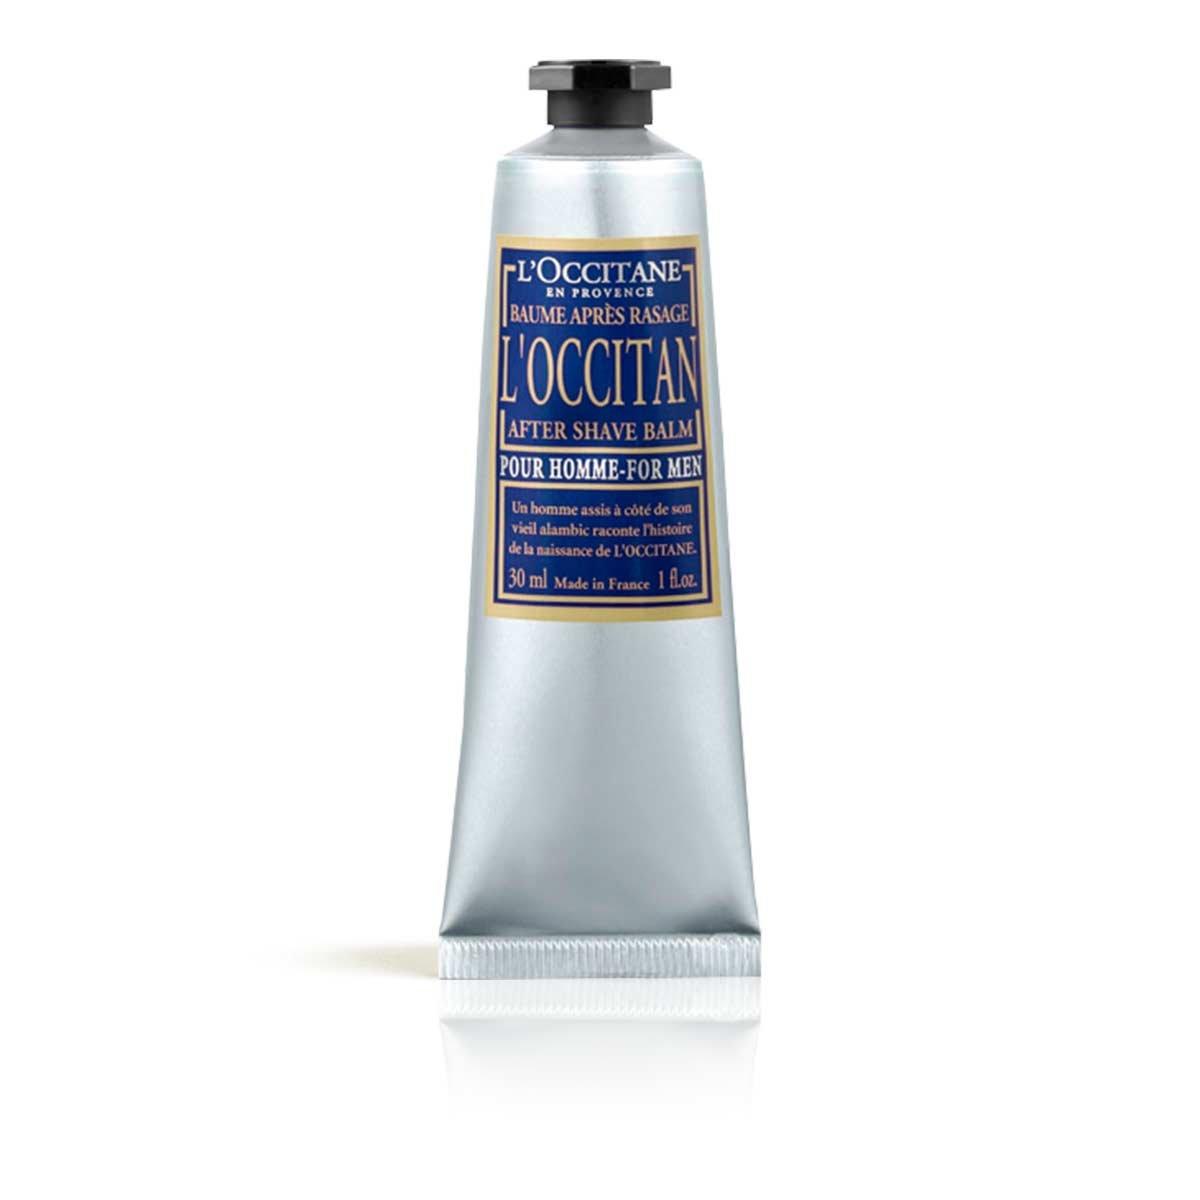 L'Occitan After Shave Balm (Travel Size) - 30ml. L'OCCITANE